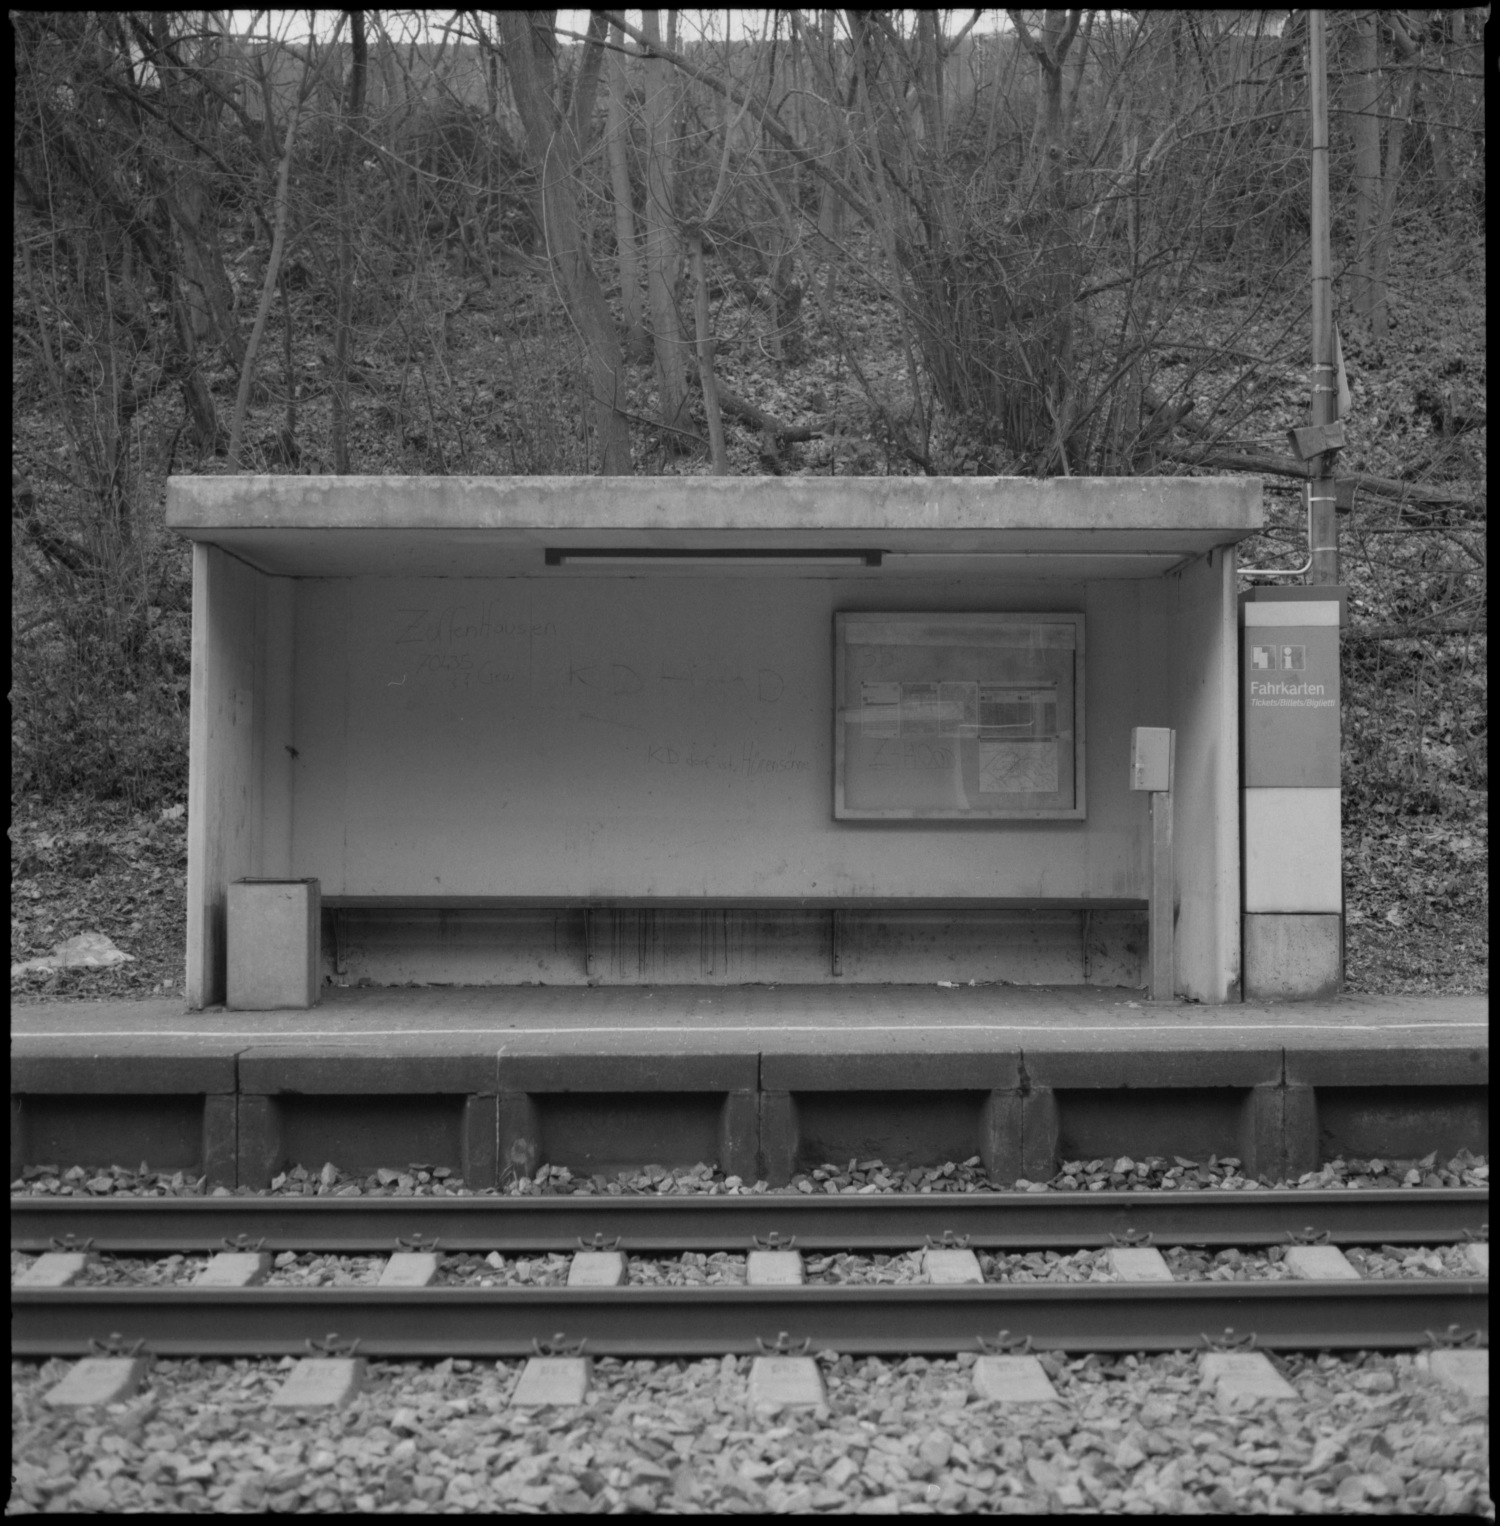 Haltepunkt Zazenhausen II